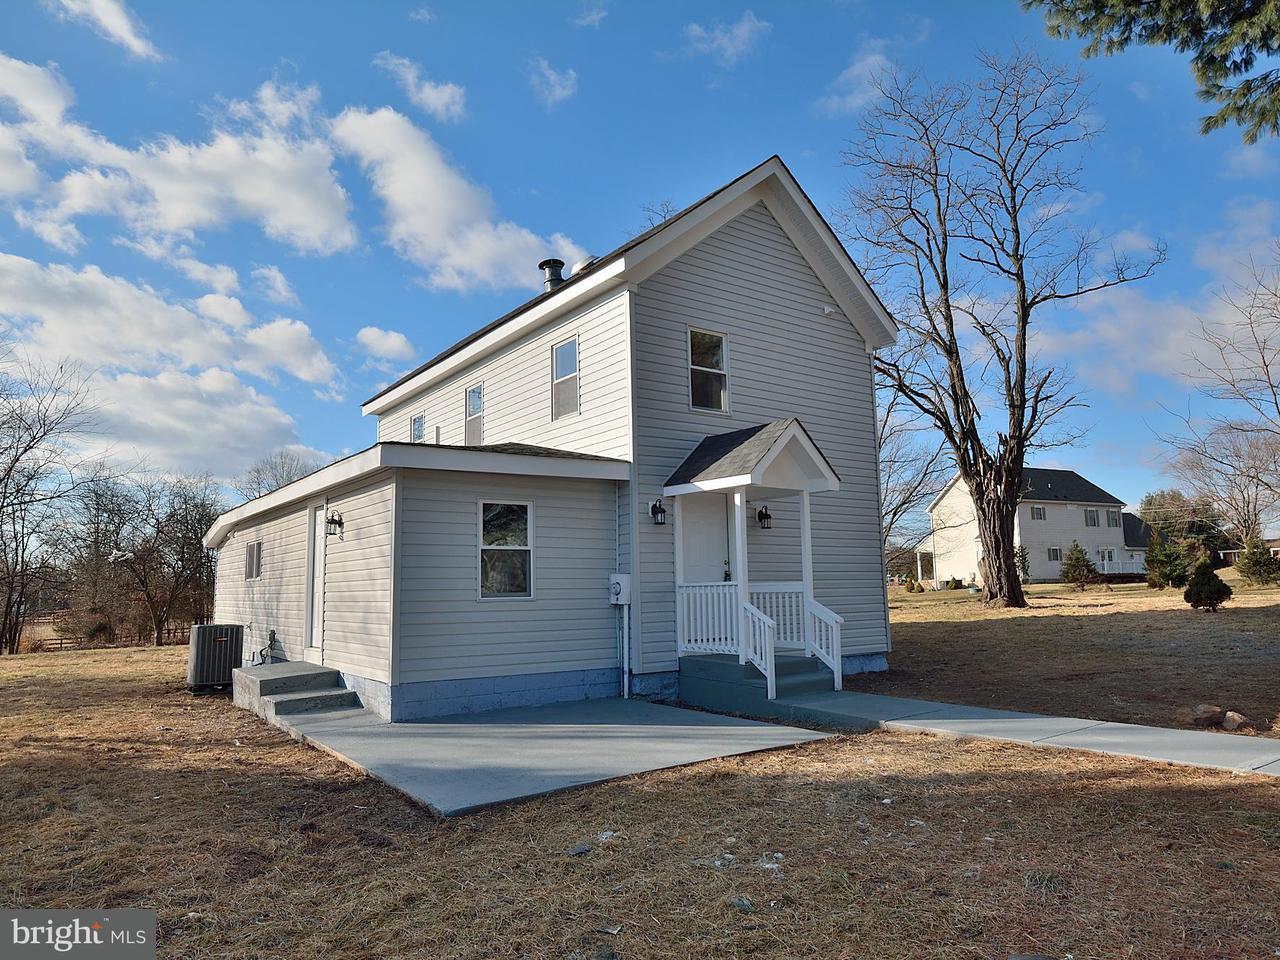 独户住宅 为 销售 在 3707 Sanders Lane 3707 Sanders Lane Catharpin, 弗吉尼亚州 20143 美国